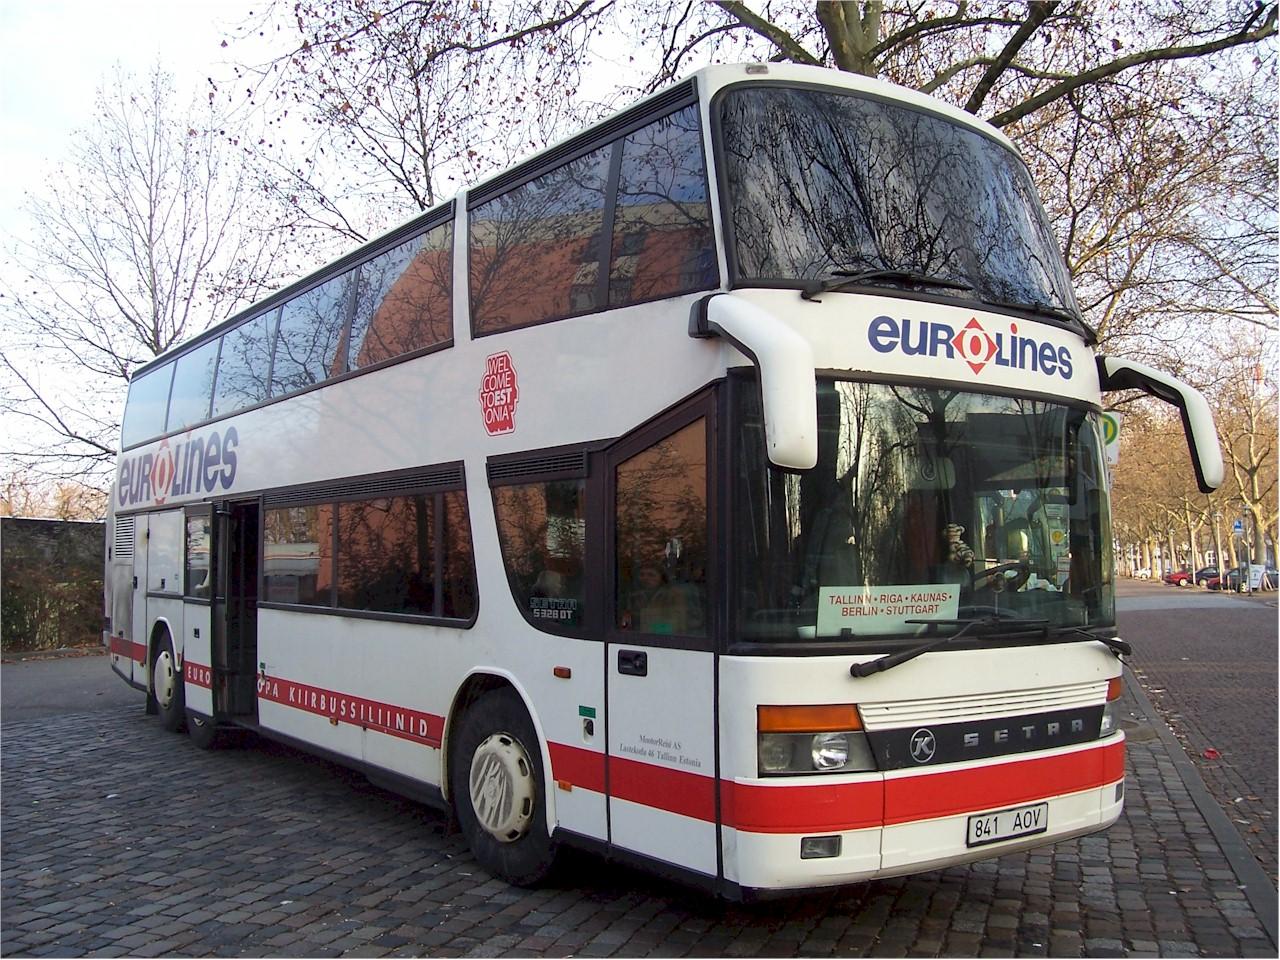 Eurolines-Mannheim-Germany-Estonia